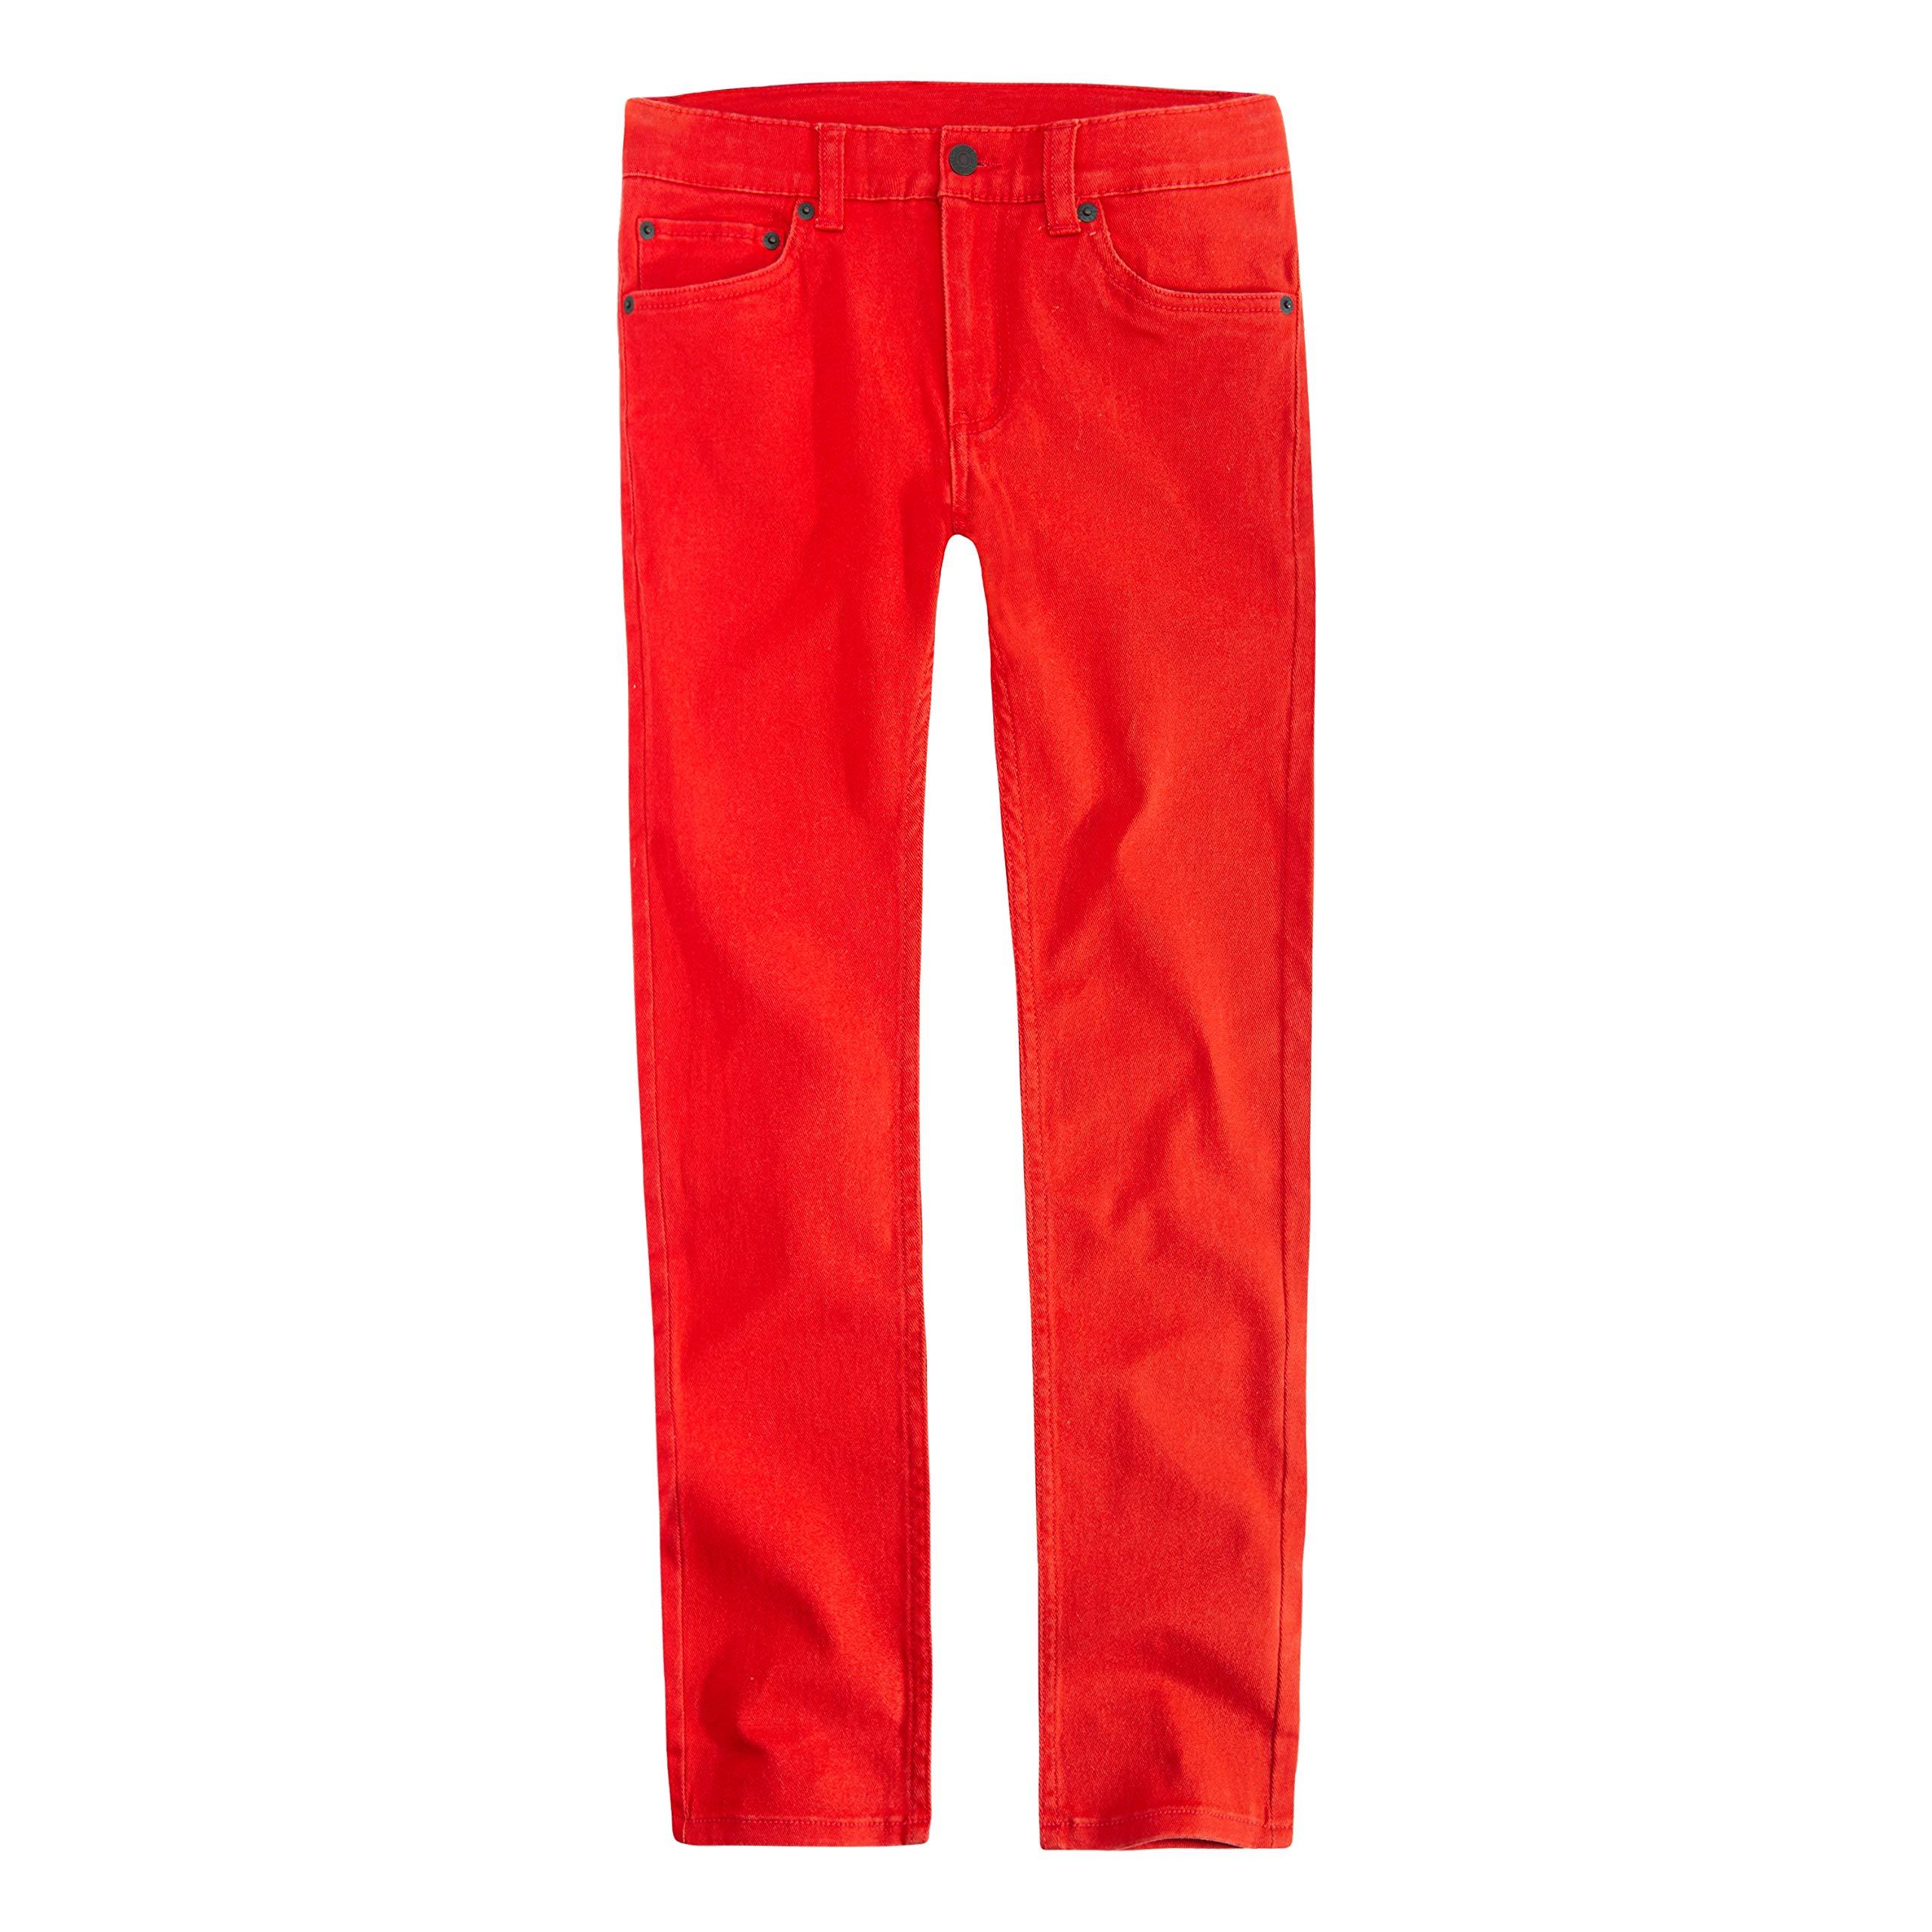 Levi's Boys' Big 510 Skinny Fit Jeans, Aura Orange, 8 by Levi's (Image #1)